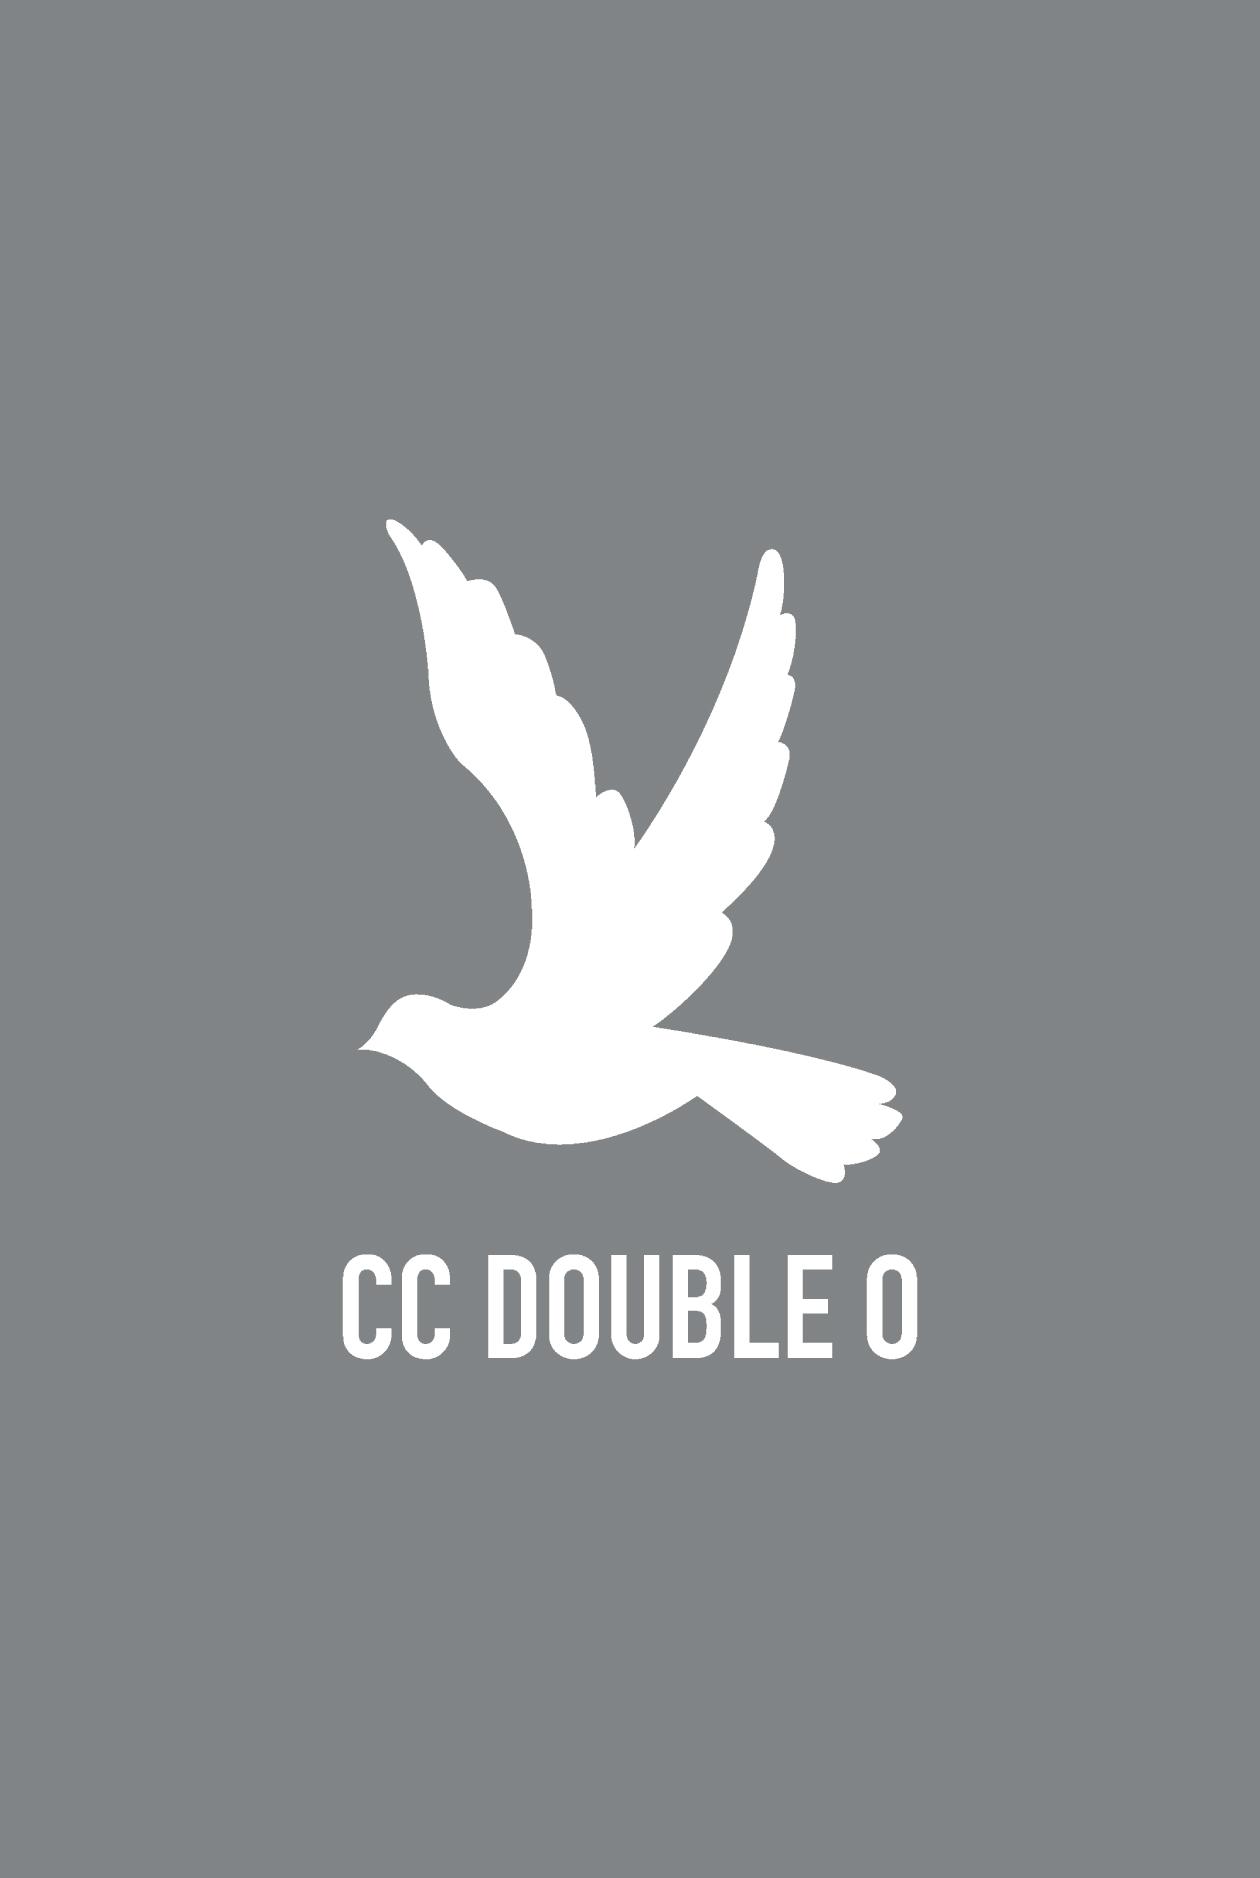 CC DOUBLE O Passport cover